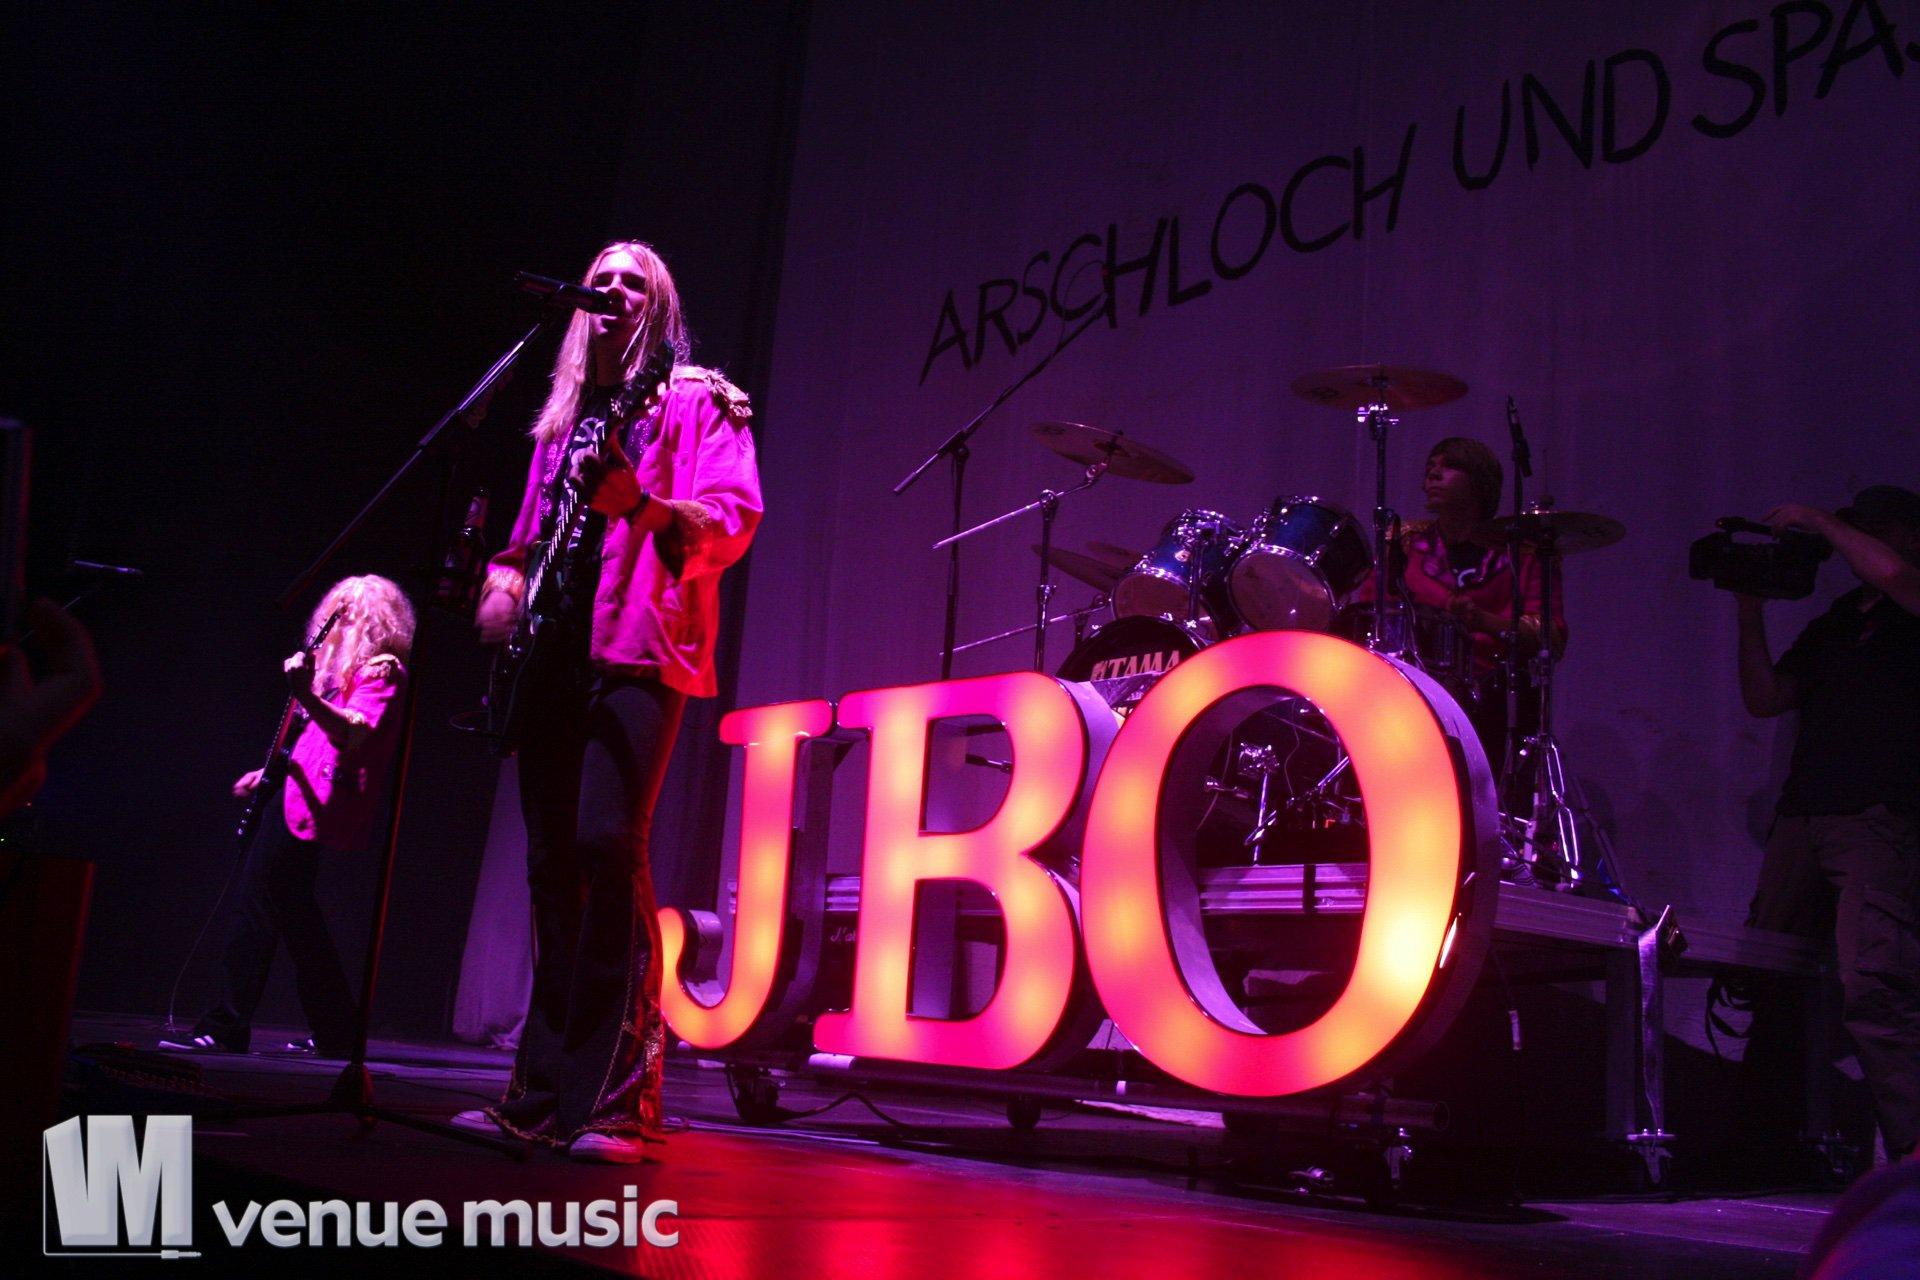 J.B.O. & Gäste: 2.000 Jahre J.B.O., Jako Arena Bamberg